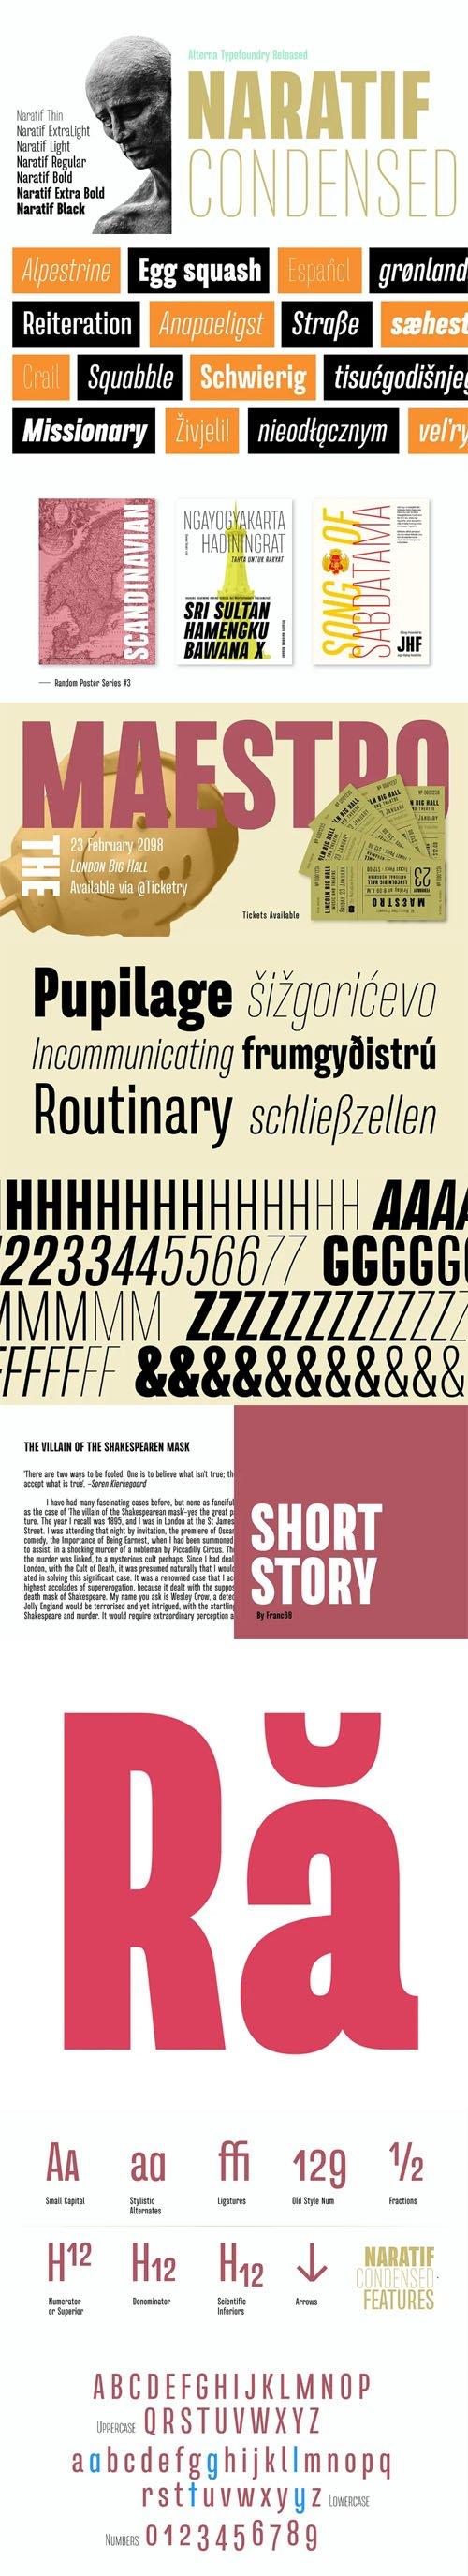 Naratif Condensed Display Font [2-Weights]